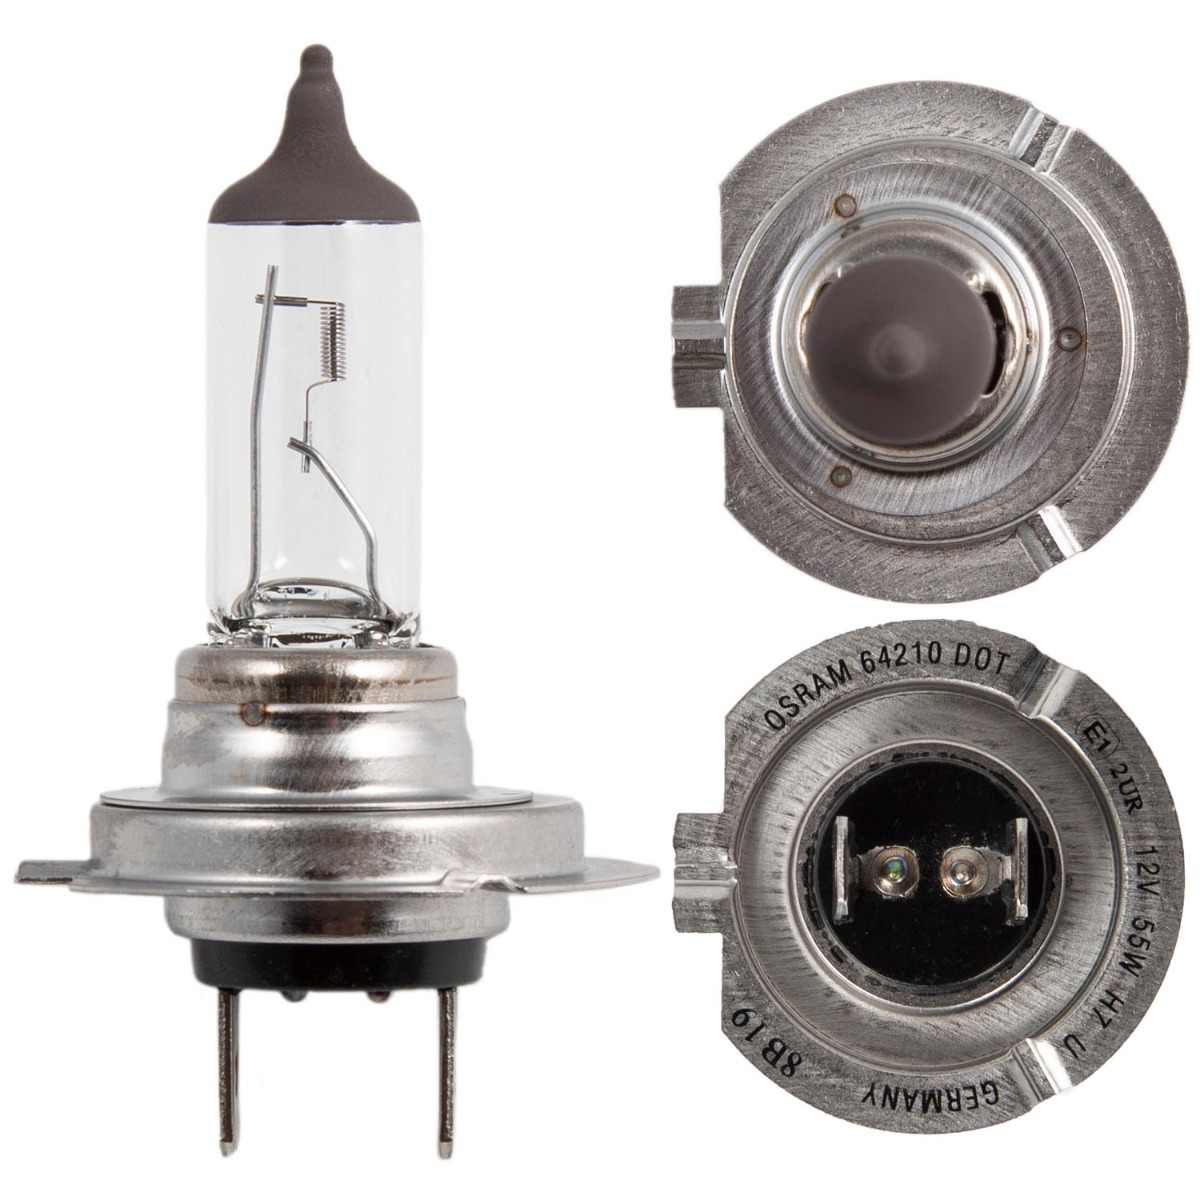 H7 stock bulb